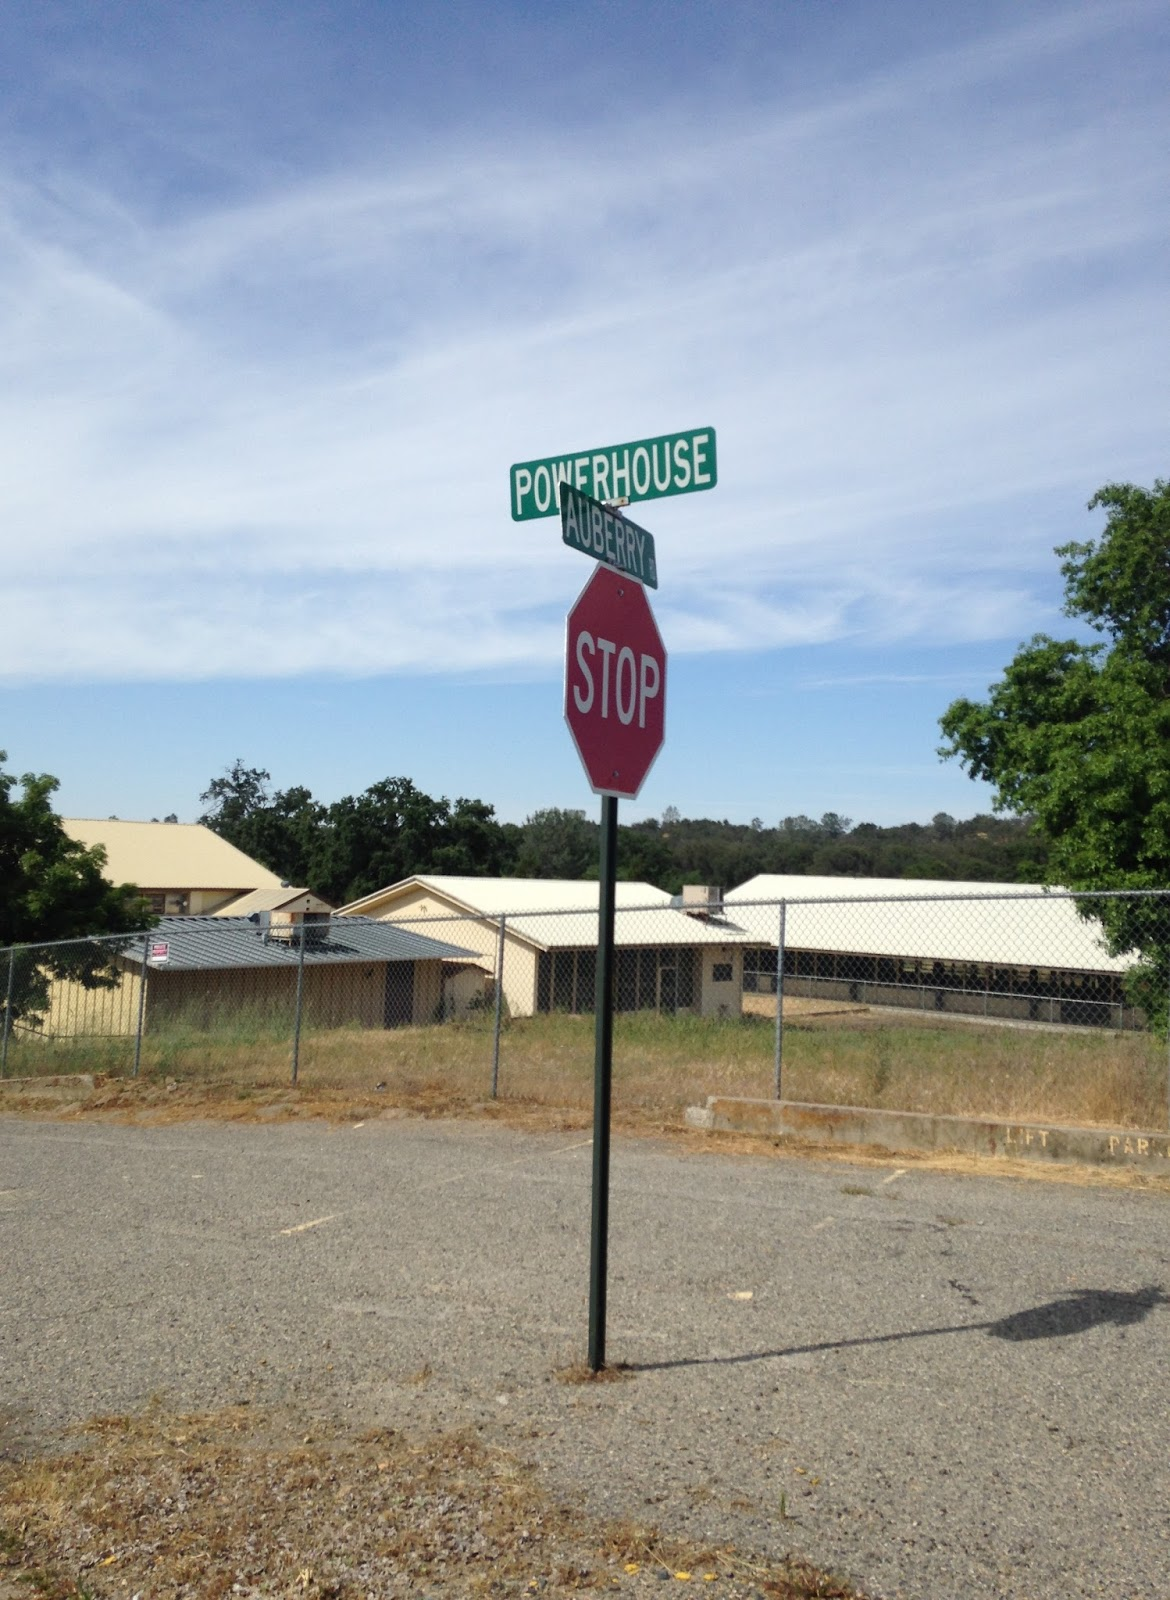 Road 222/Powerhouse Road